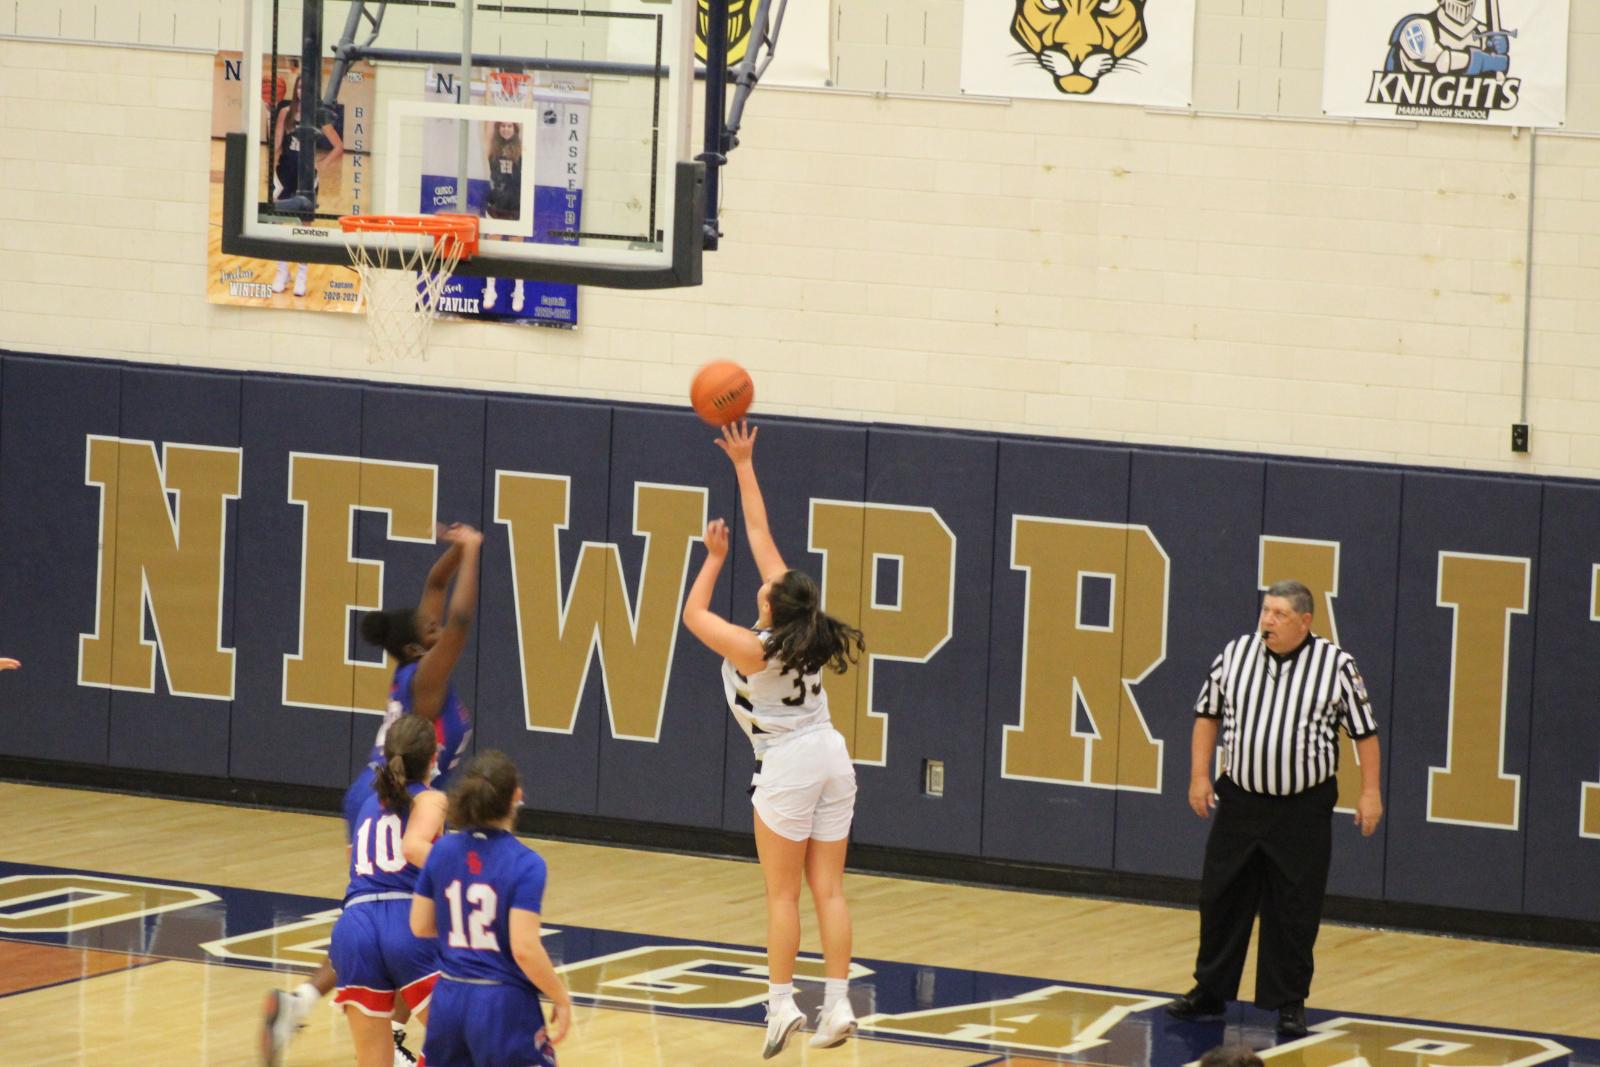 Varsity Girls Basketball vs. South Bend Adams 11/20/20  (Photo Gallery)